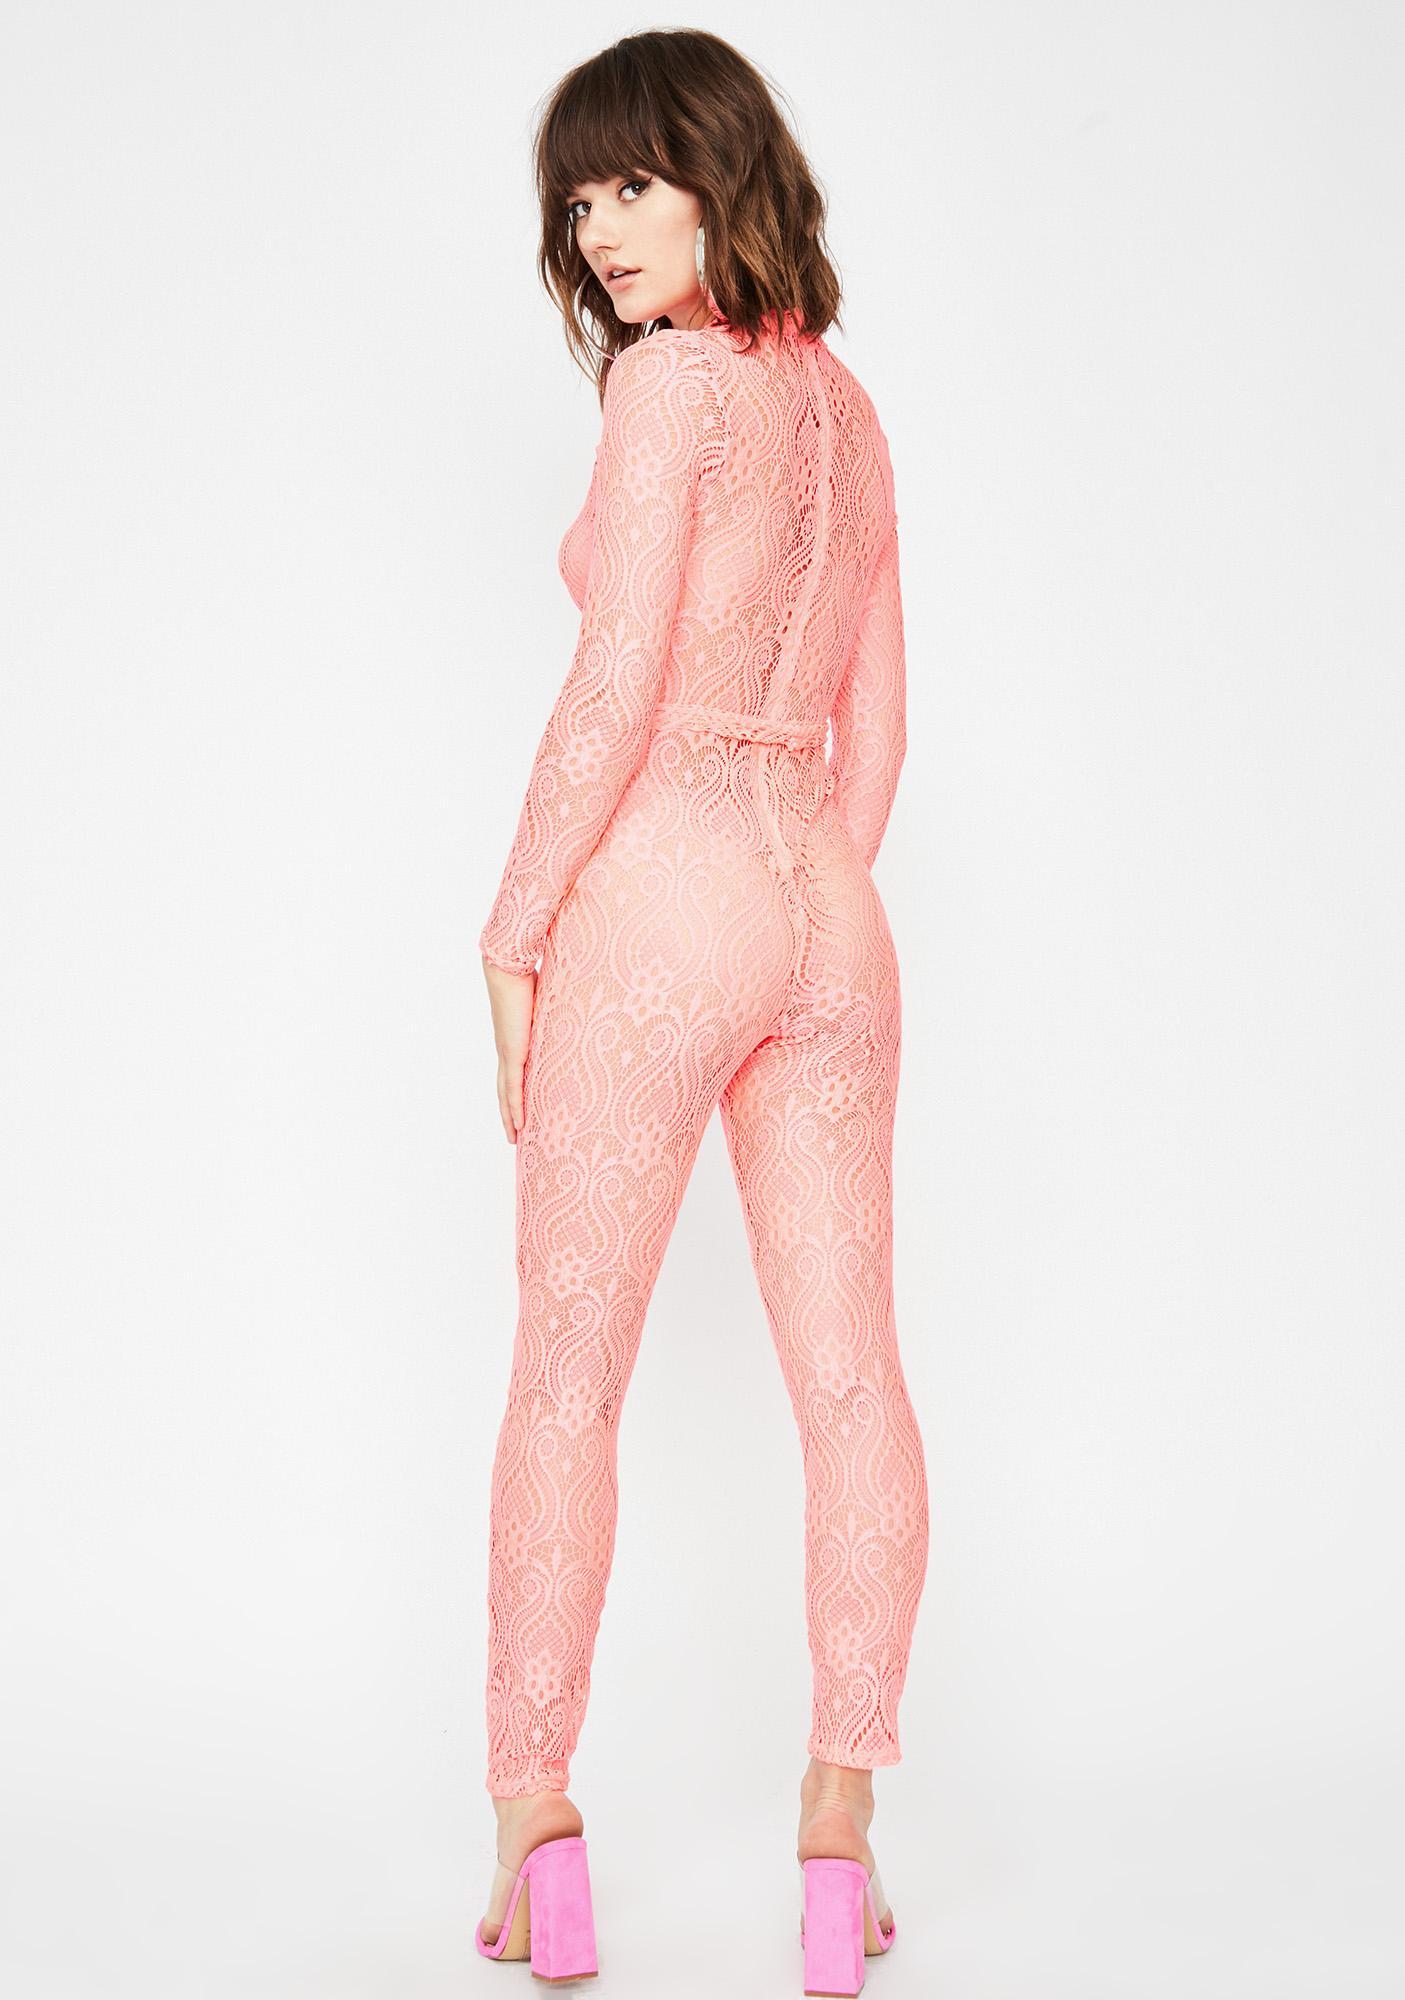 Lace A La Mode O-Ring Catsuit